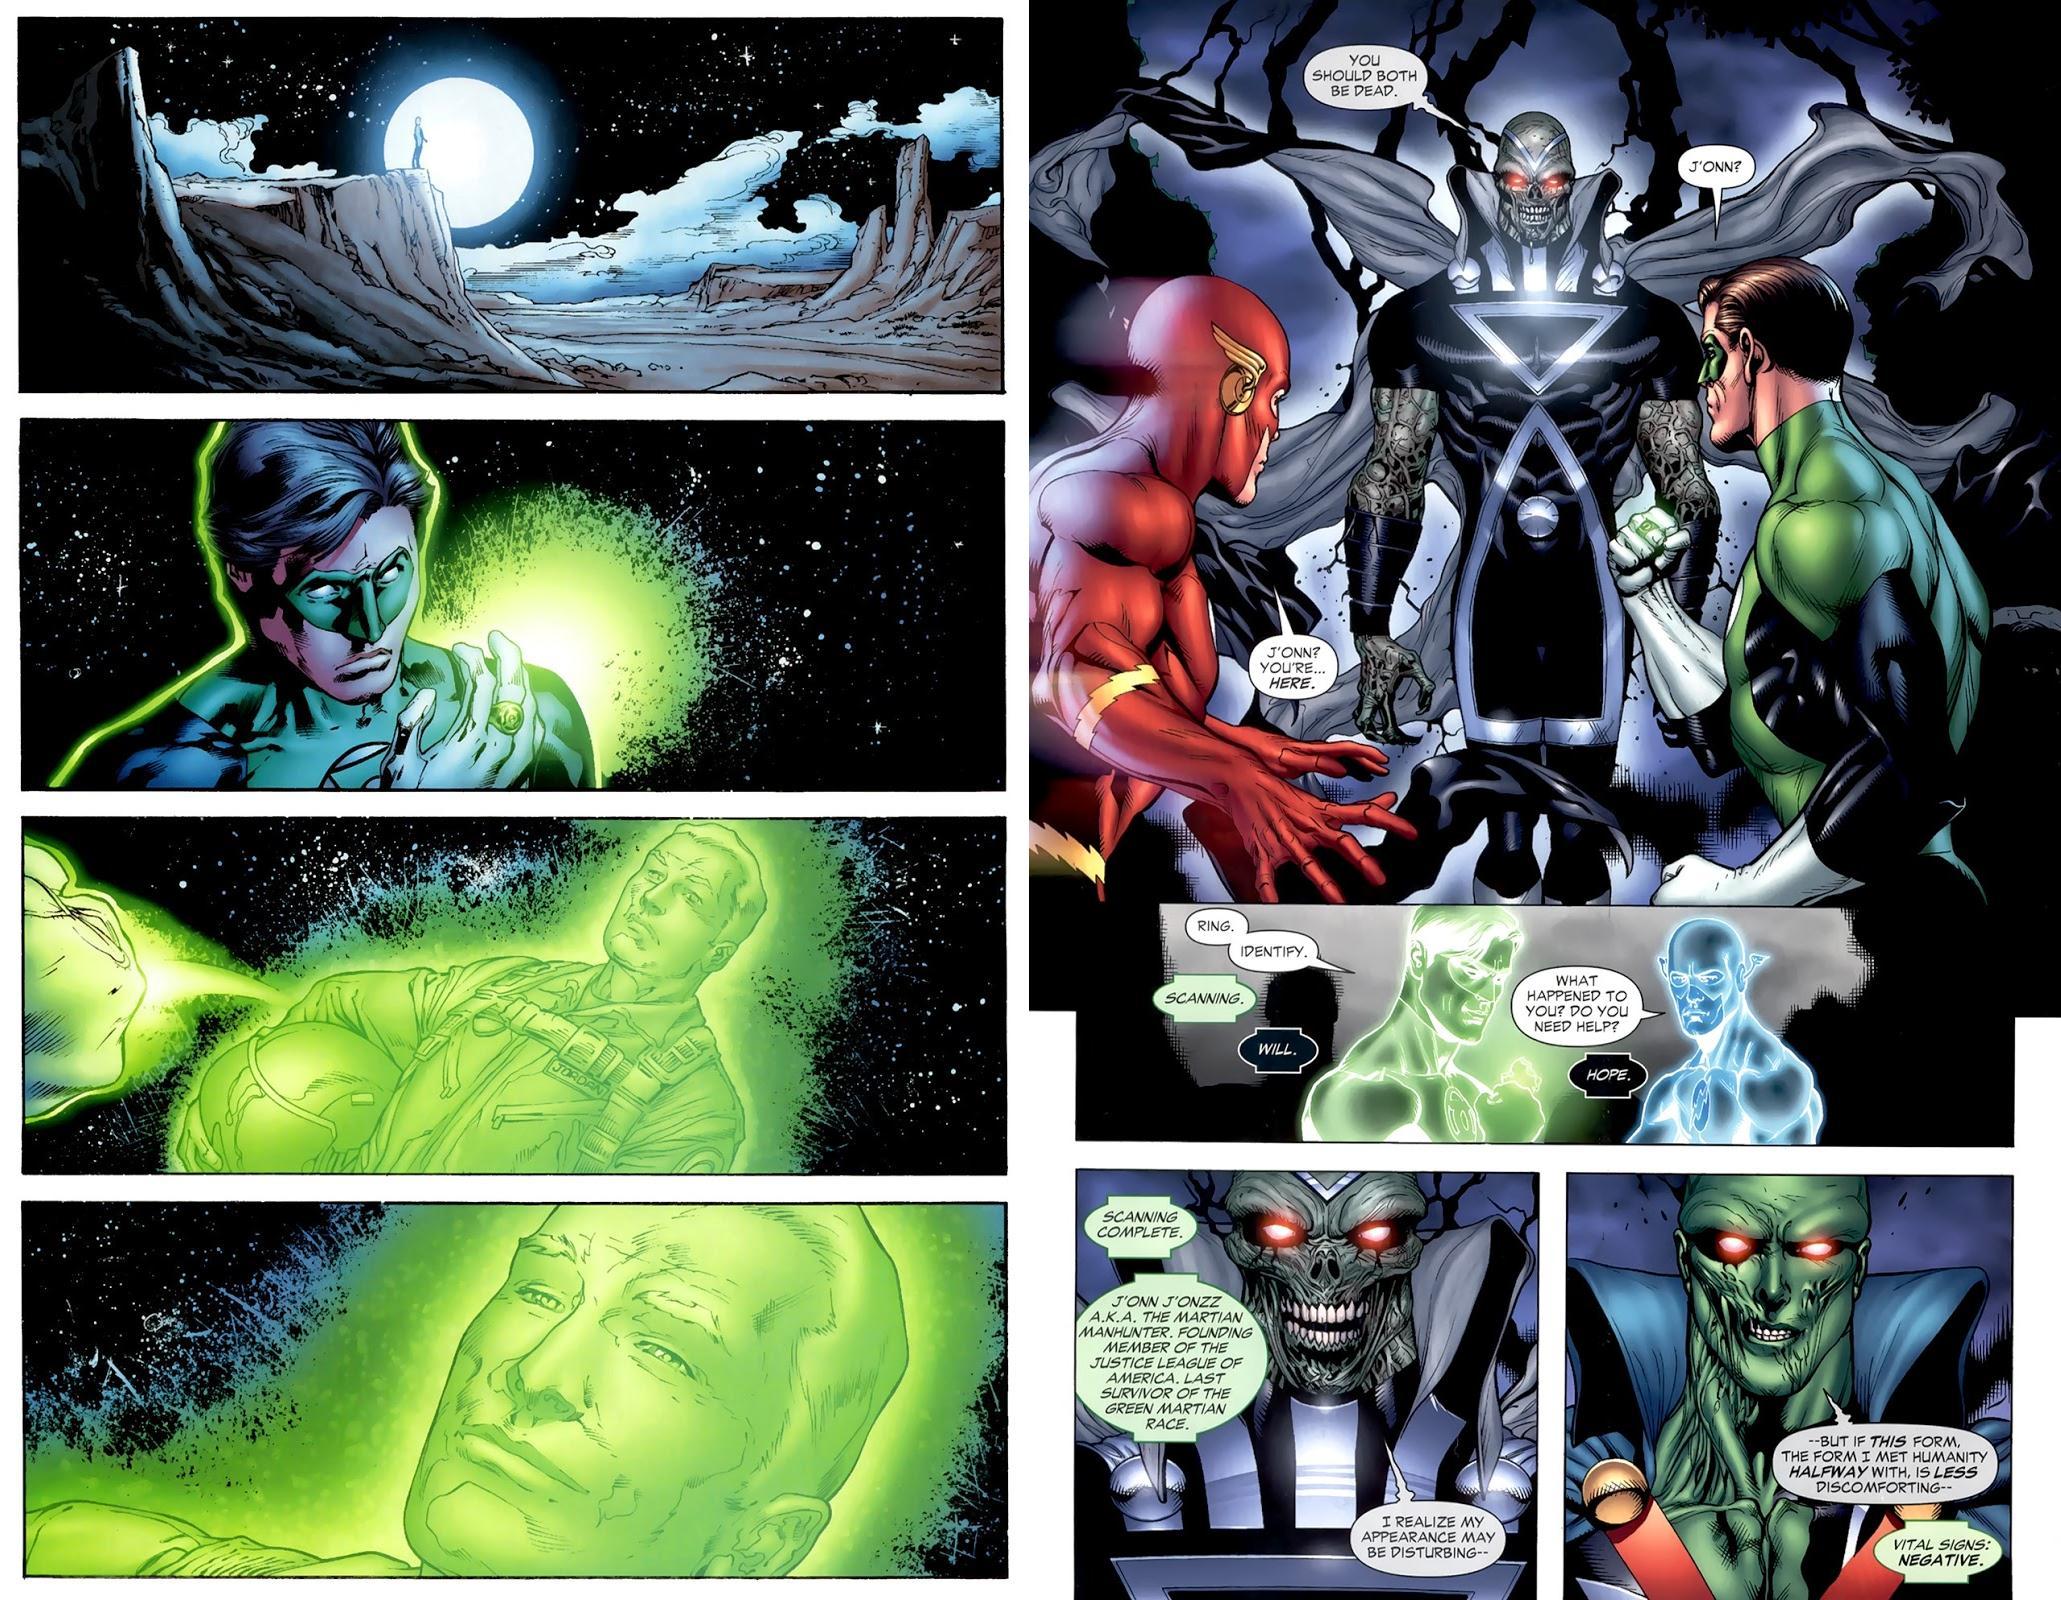 Green Lantern by Geoff Johns Omni V2 review